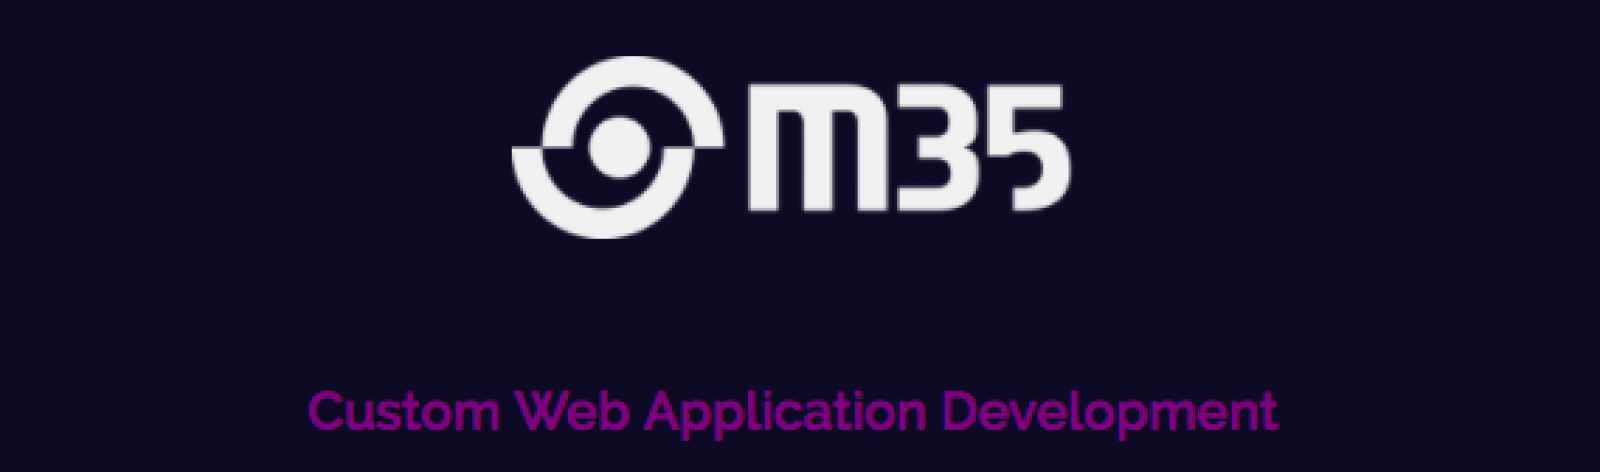 M35 Development